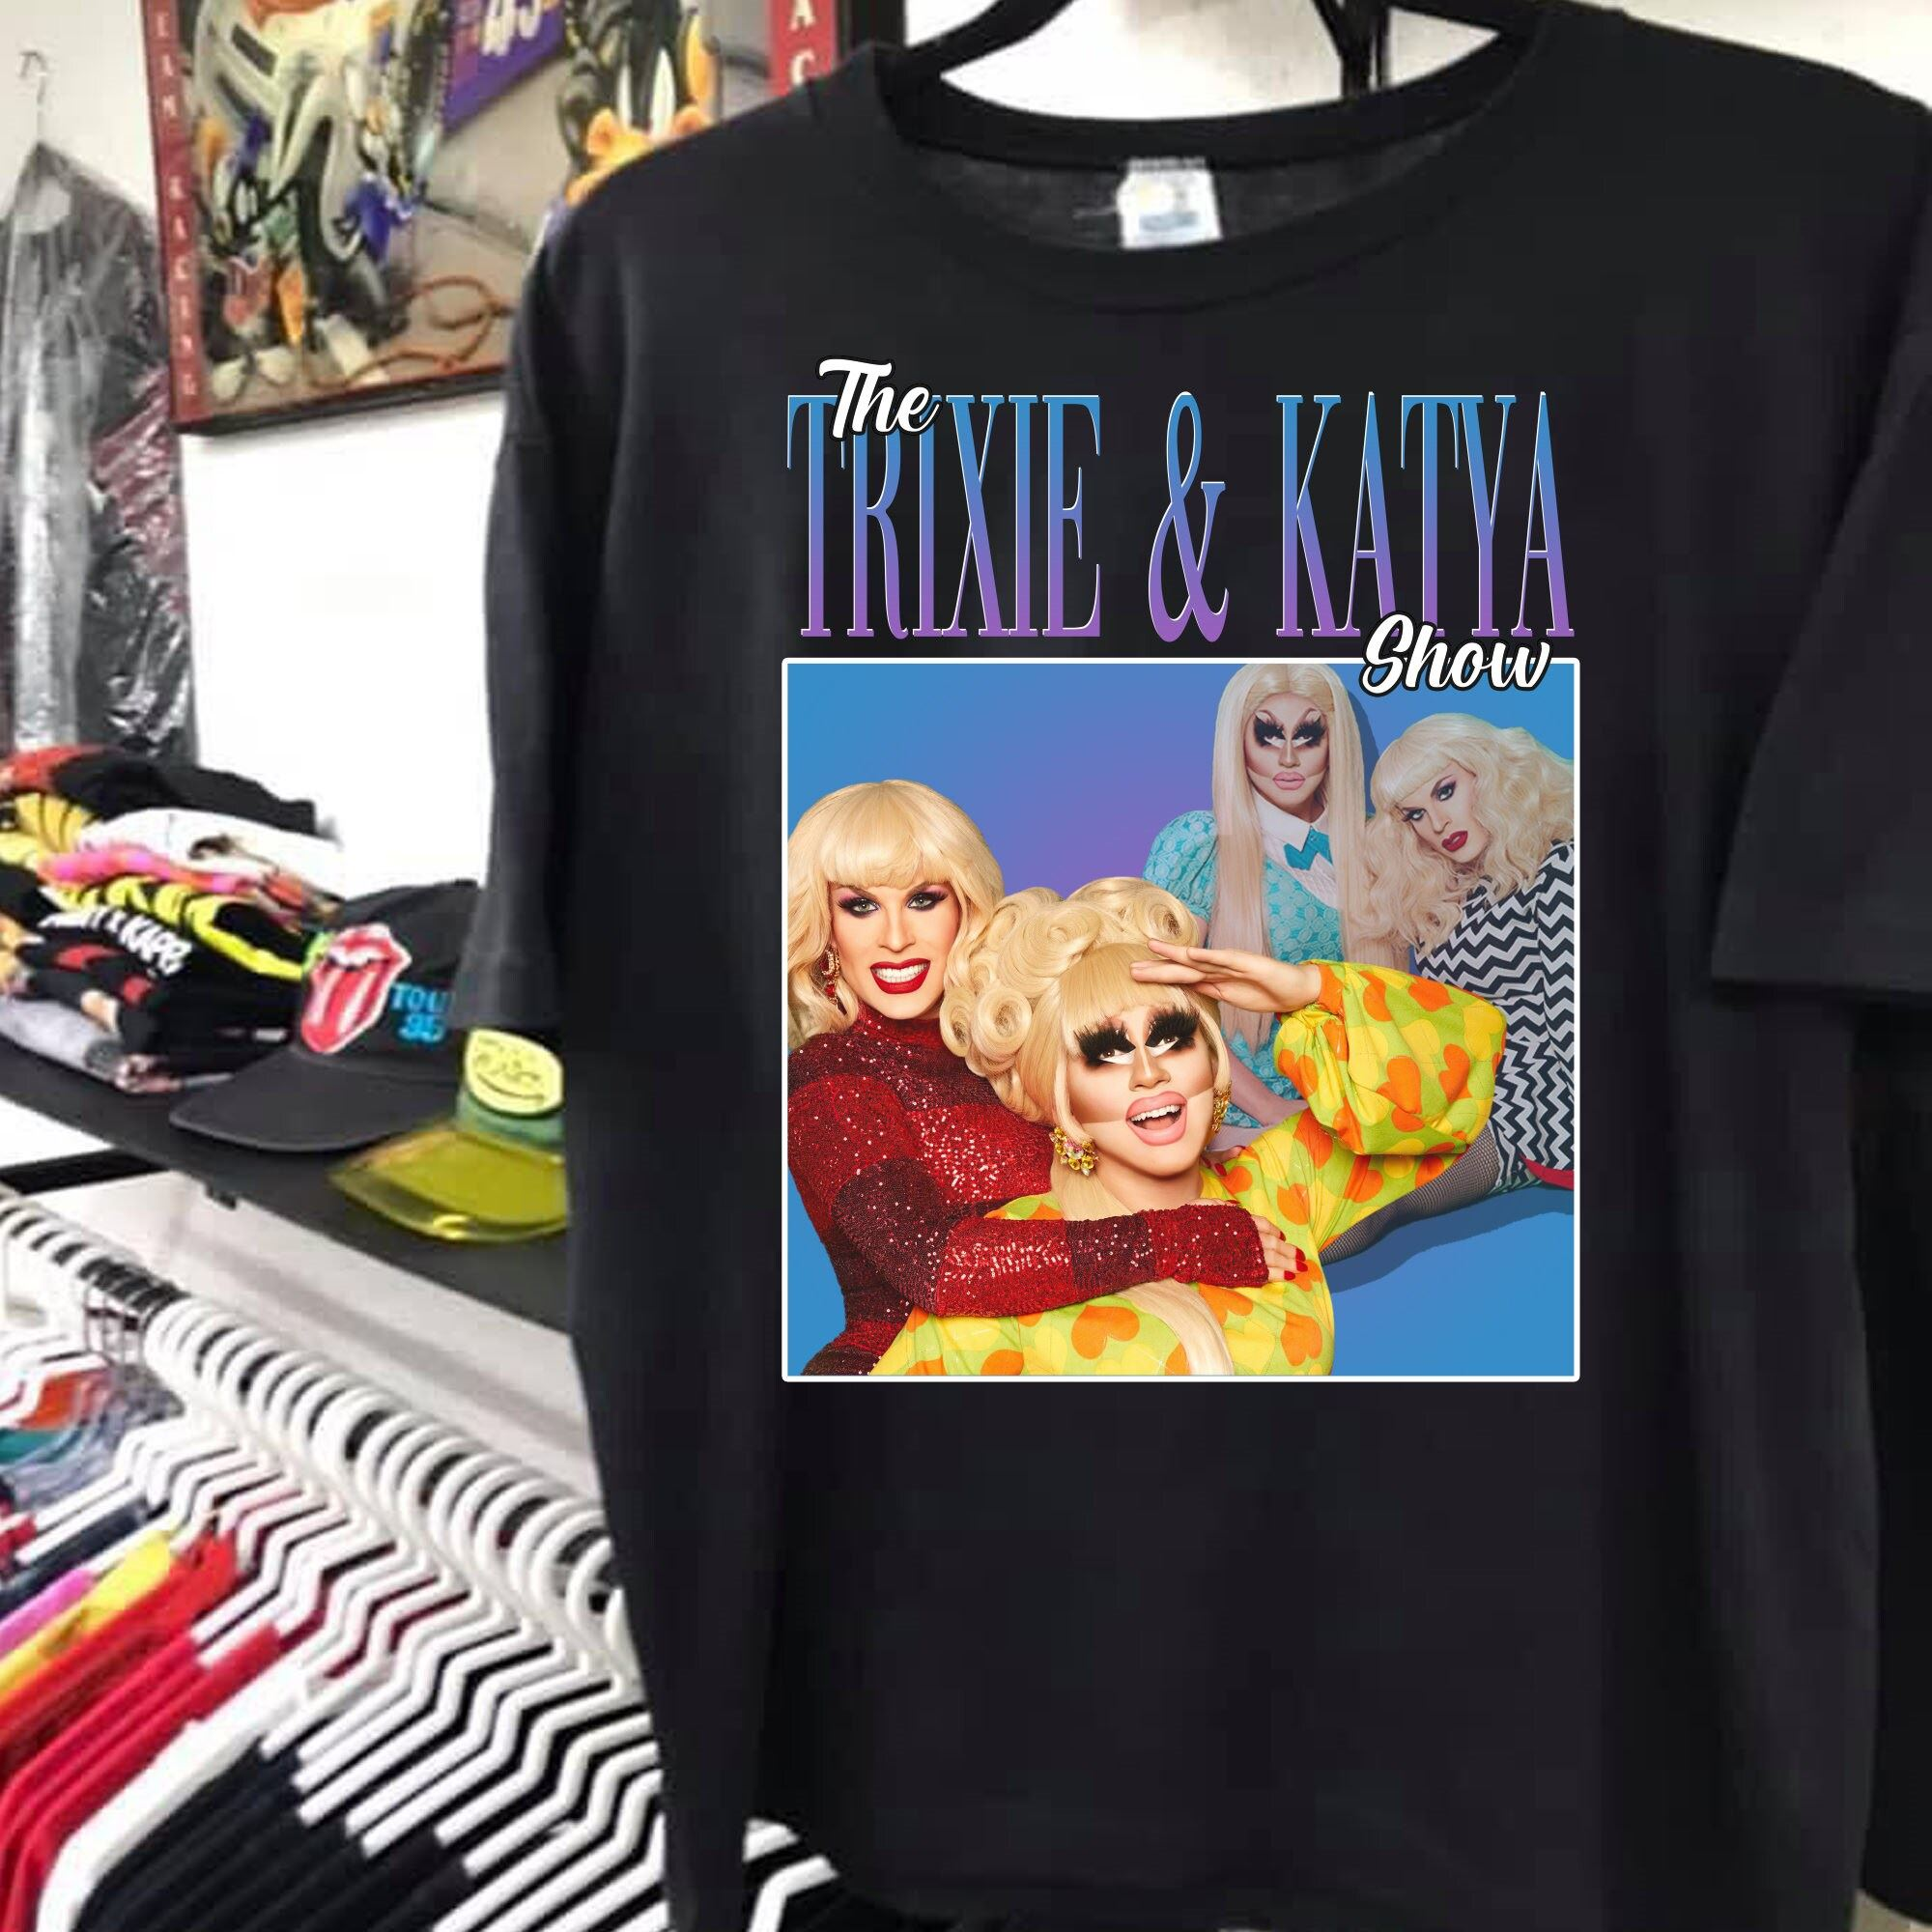 Vintage Trixie Katya 90s Retro Shirt Print Art Shirt Gift For Men Women Unisex T-shirt